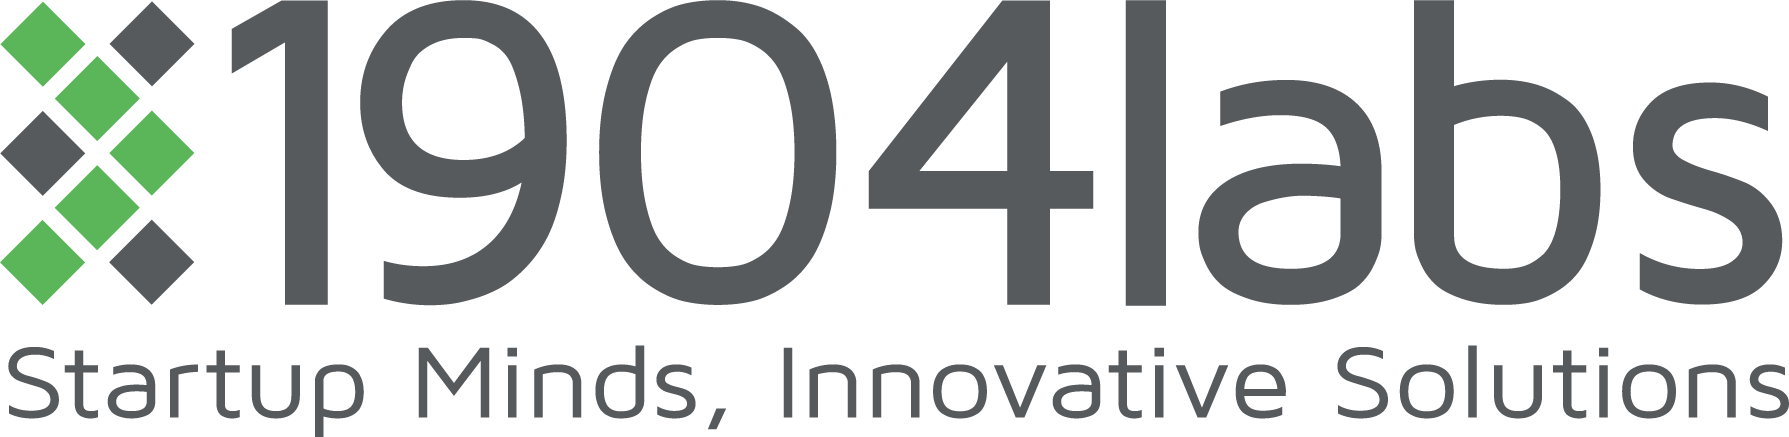 1904labs logo